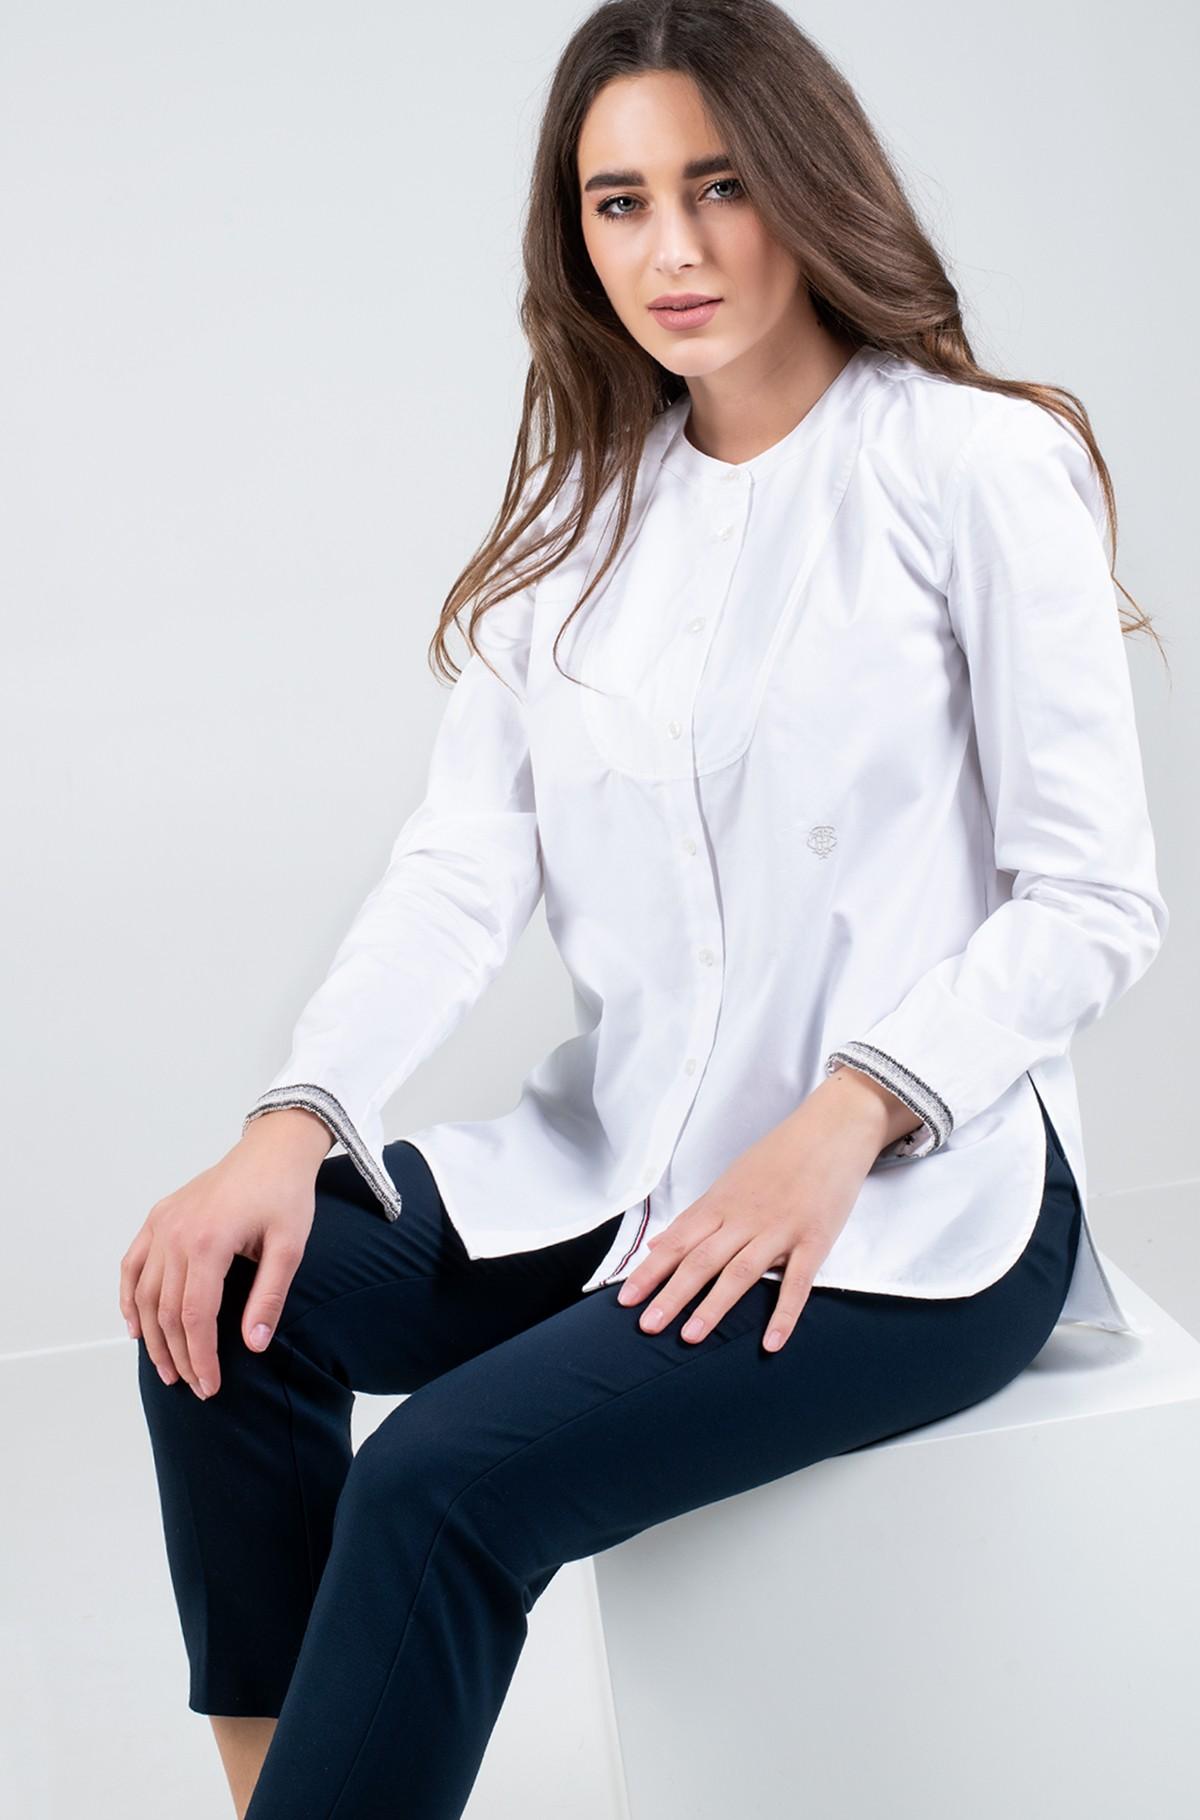 Marškiniai OC DEBBIE SHIRT LS W4-full-1